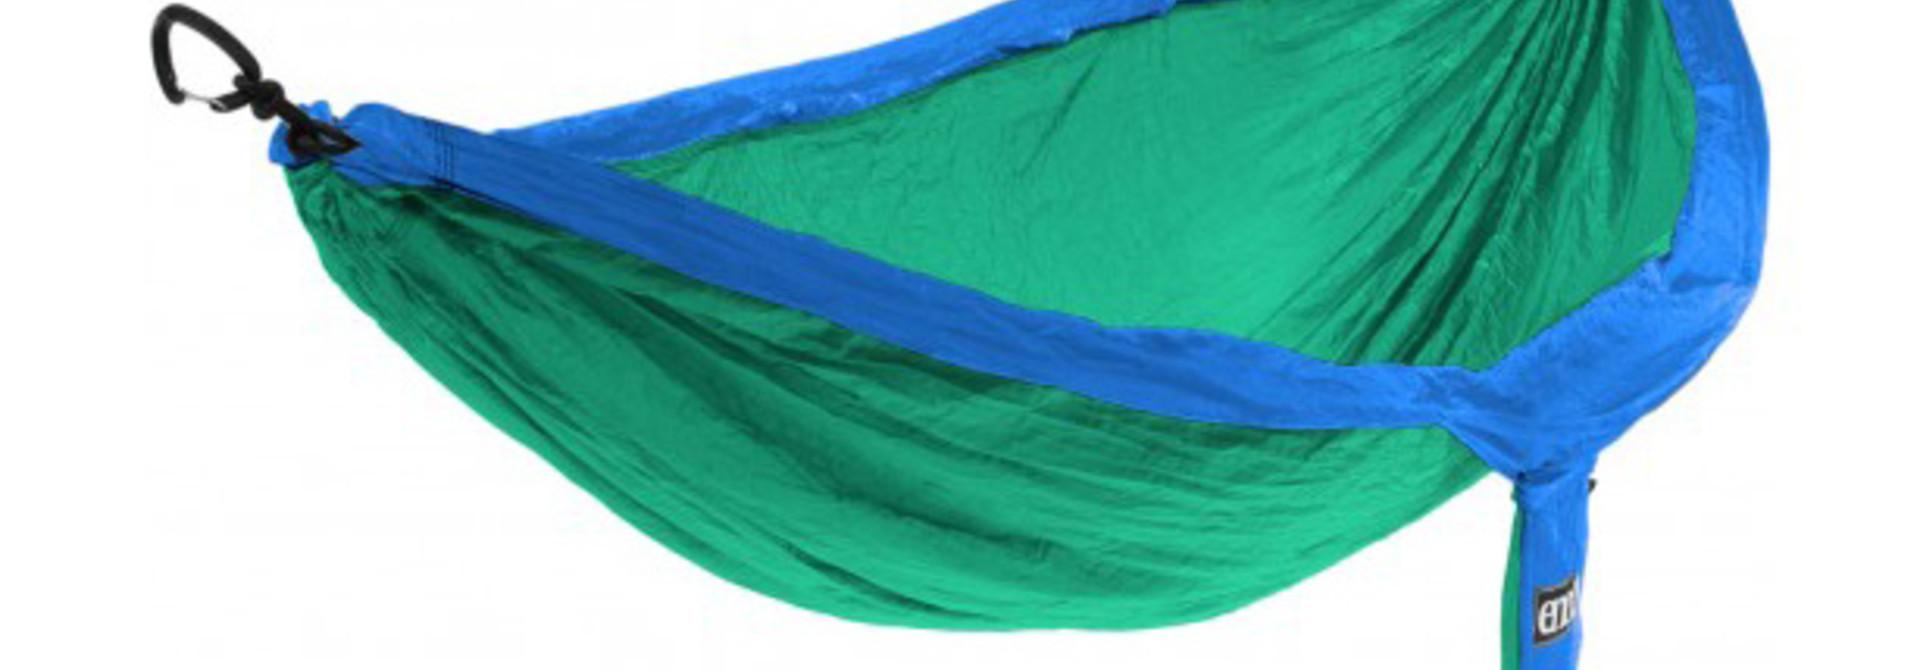 DoubleNest Hammock, Royal/Emerald